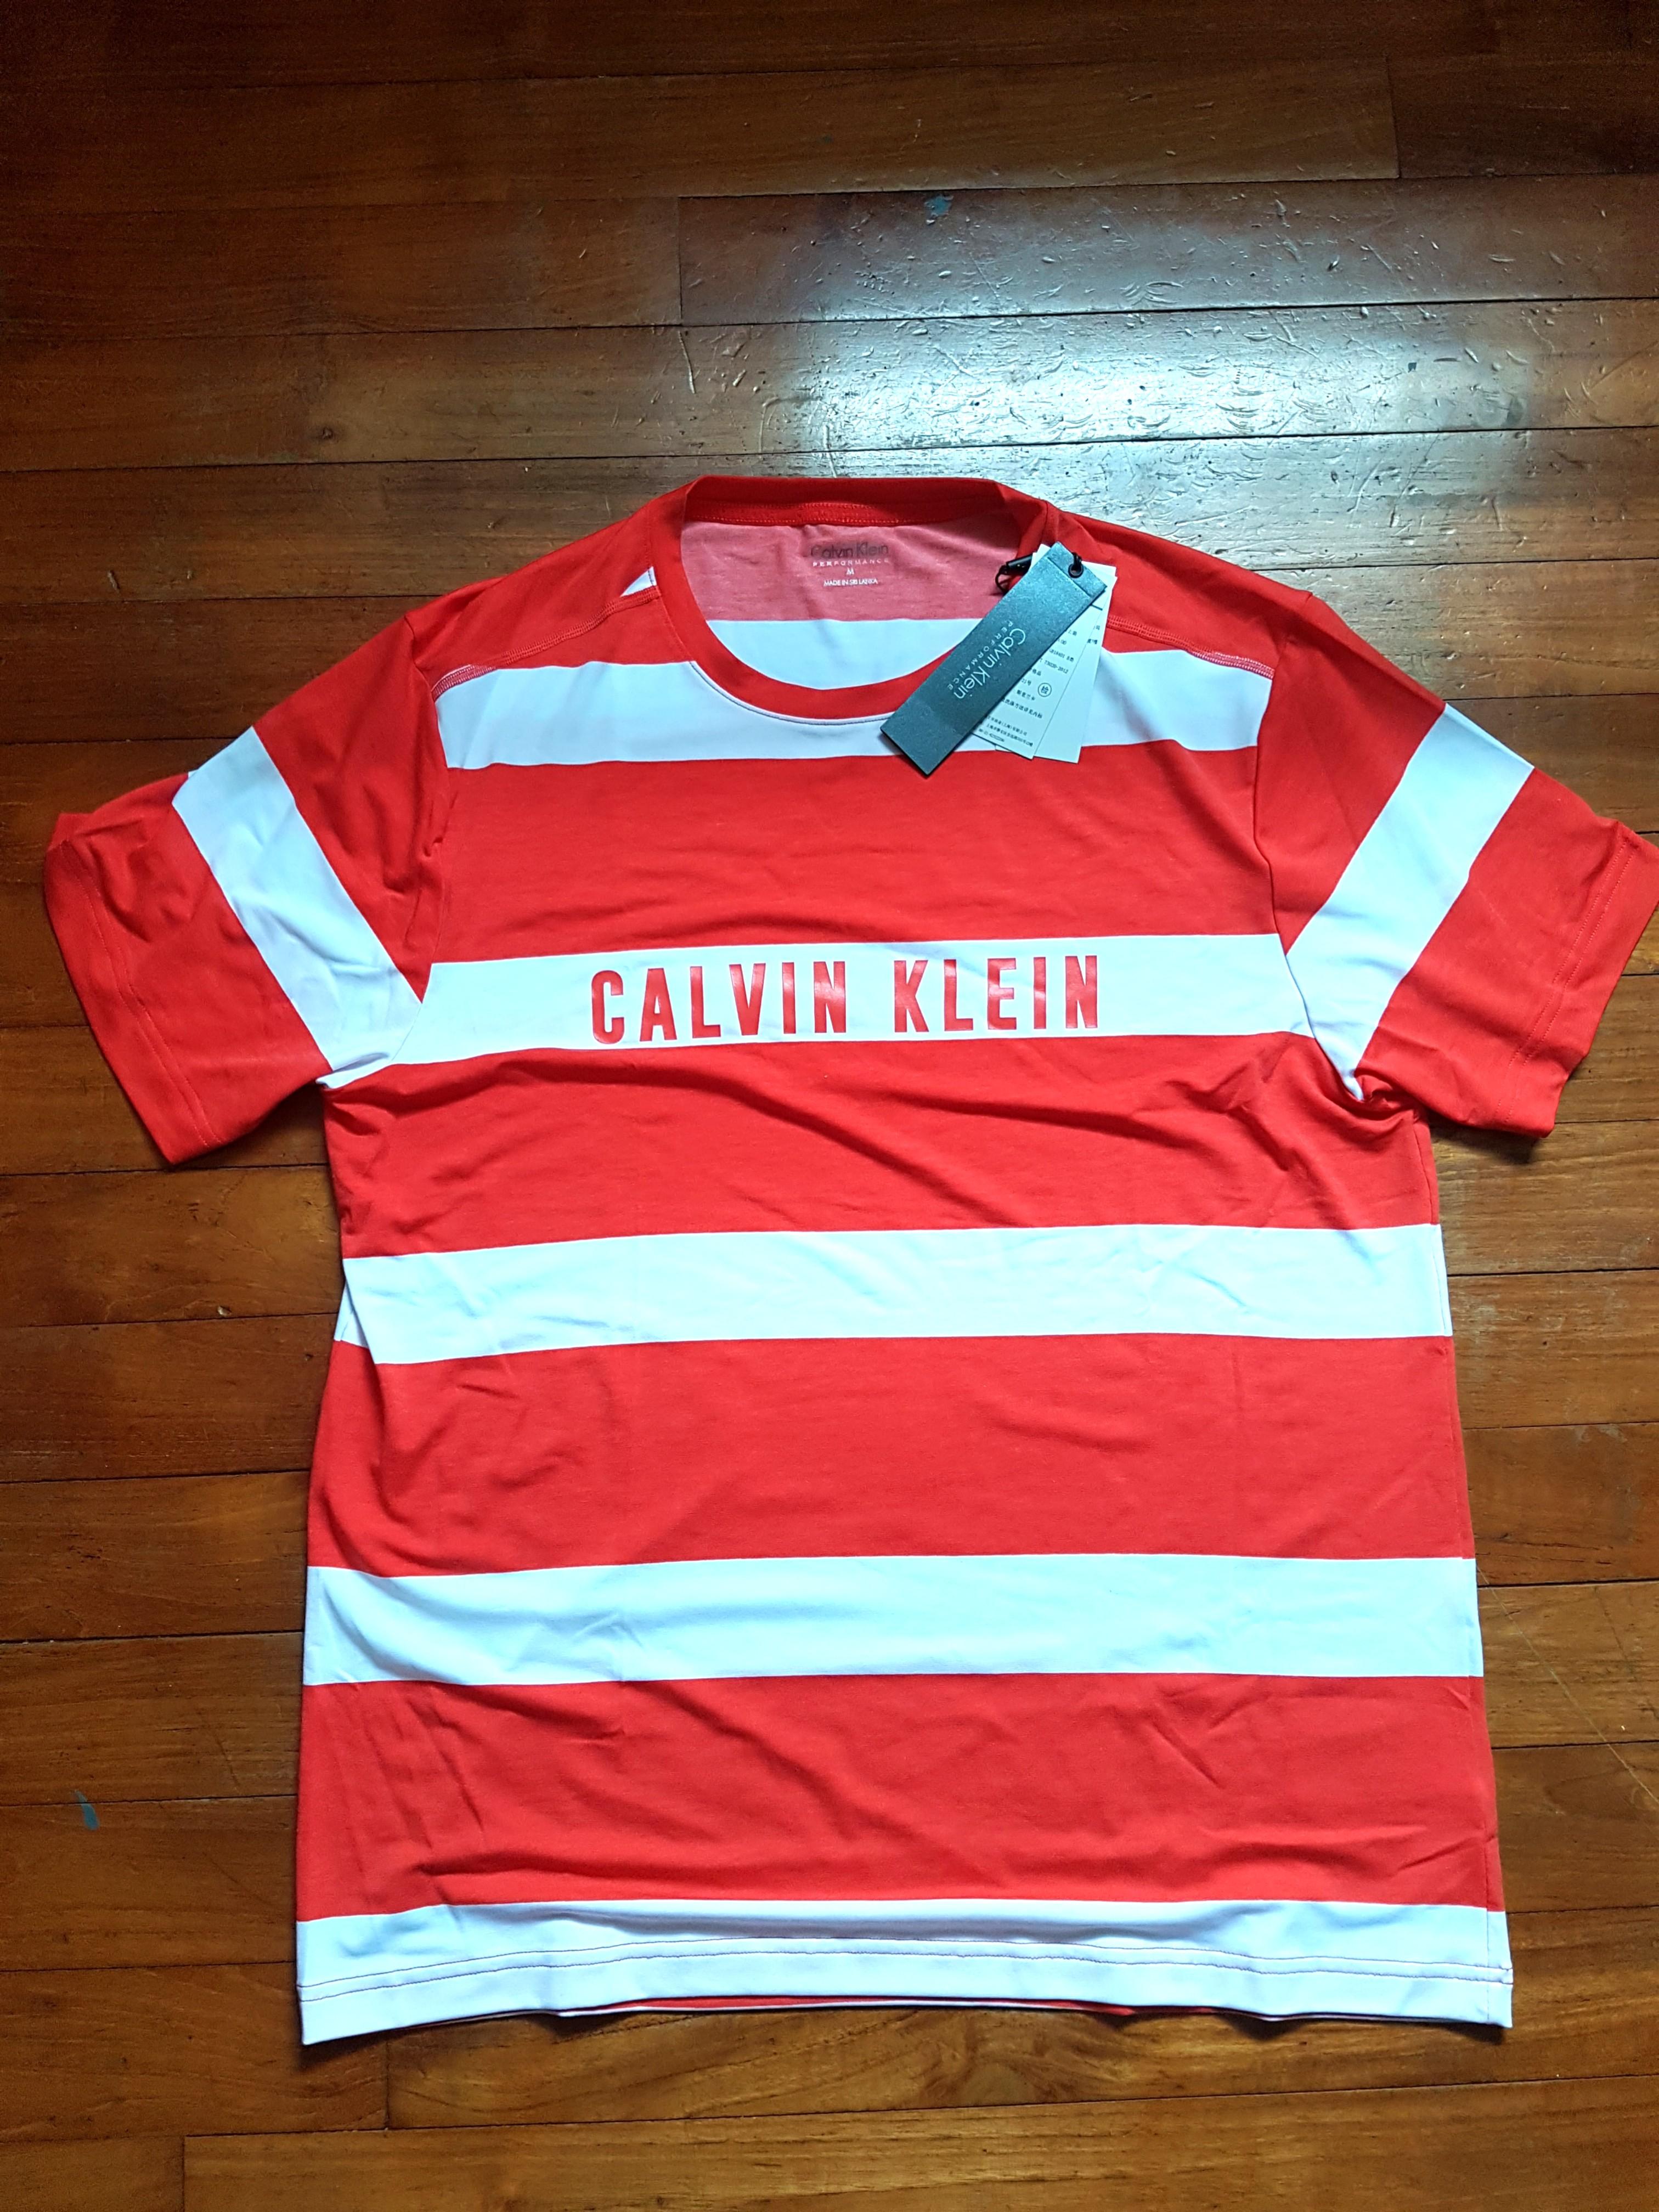 24992b8b81aa Calvin Klein Striped T-Shirt, Men's Fashion, Clothes, Tops on Carousell